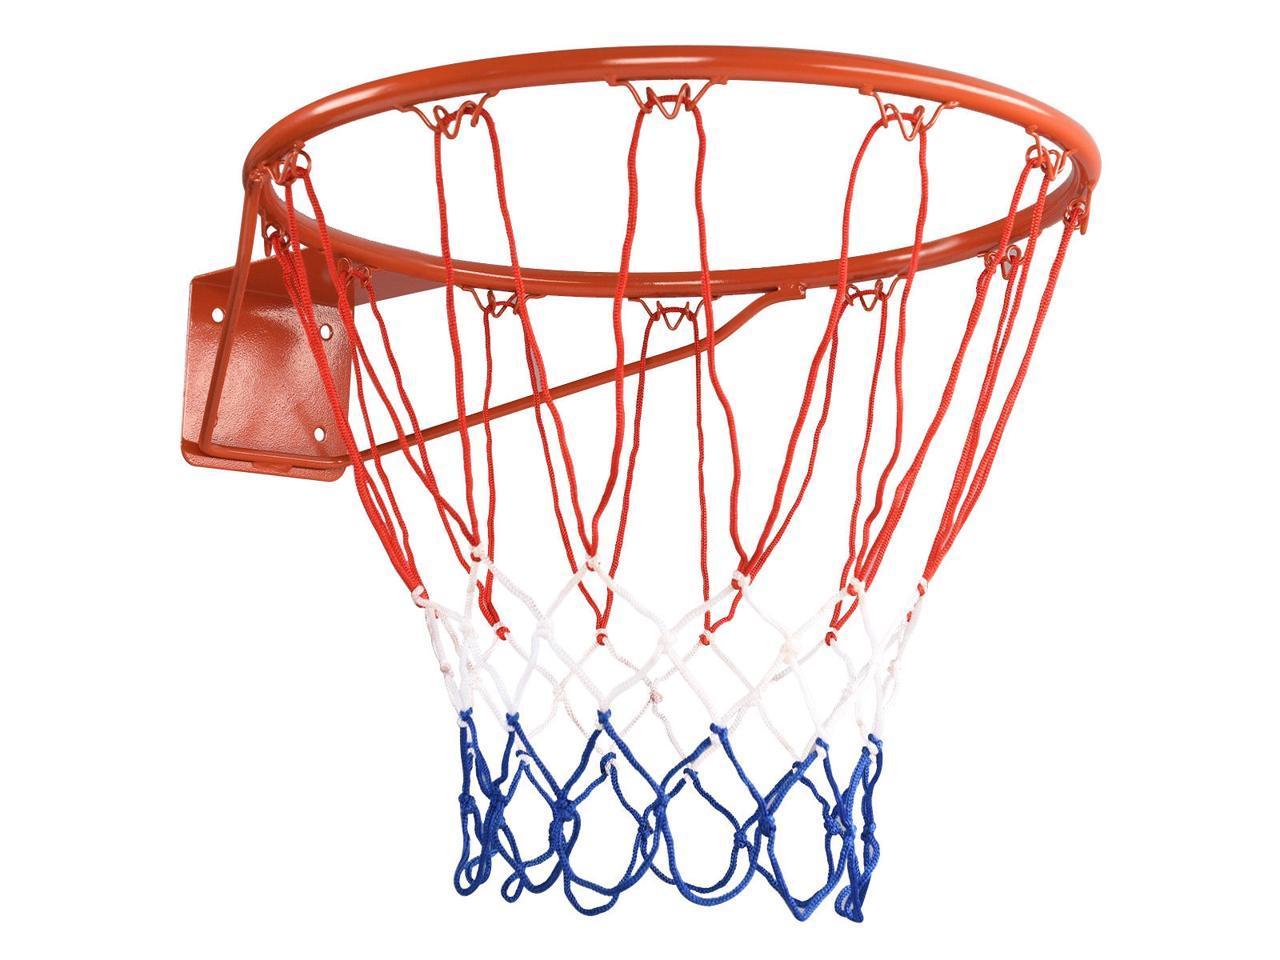 Basketball Ring Hoop Net Wall Mounted Outdoor Hanging Basket Professional US